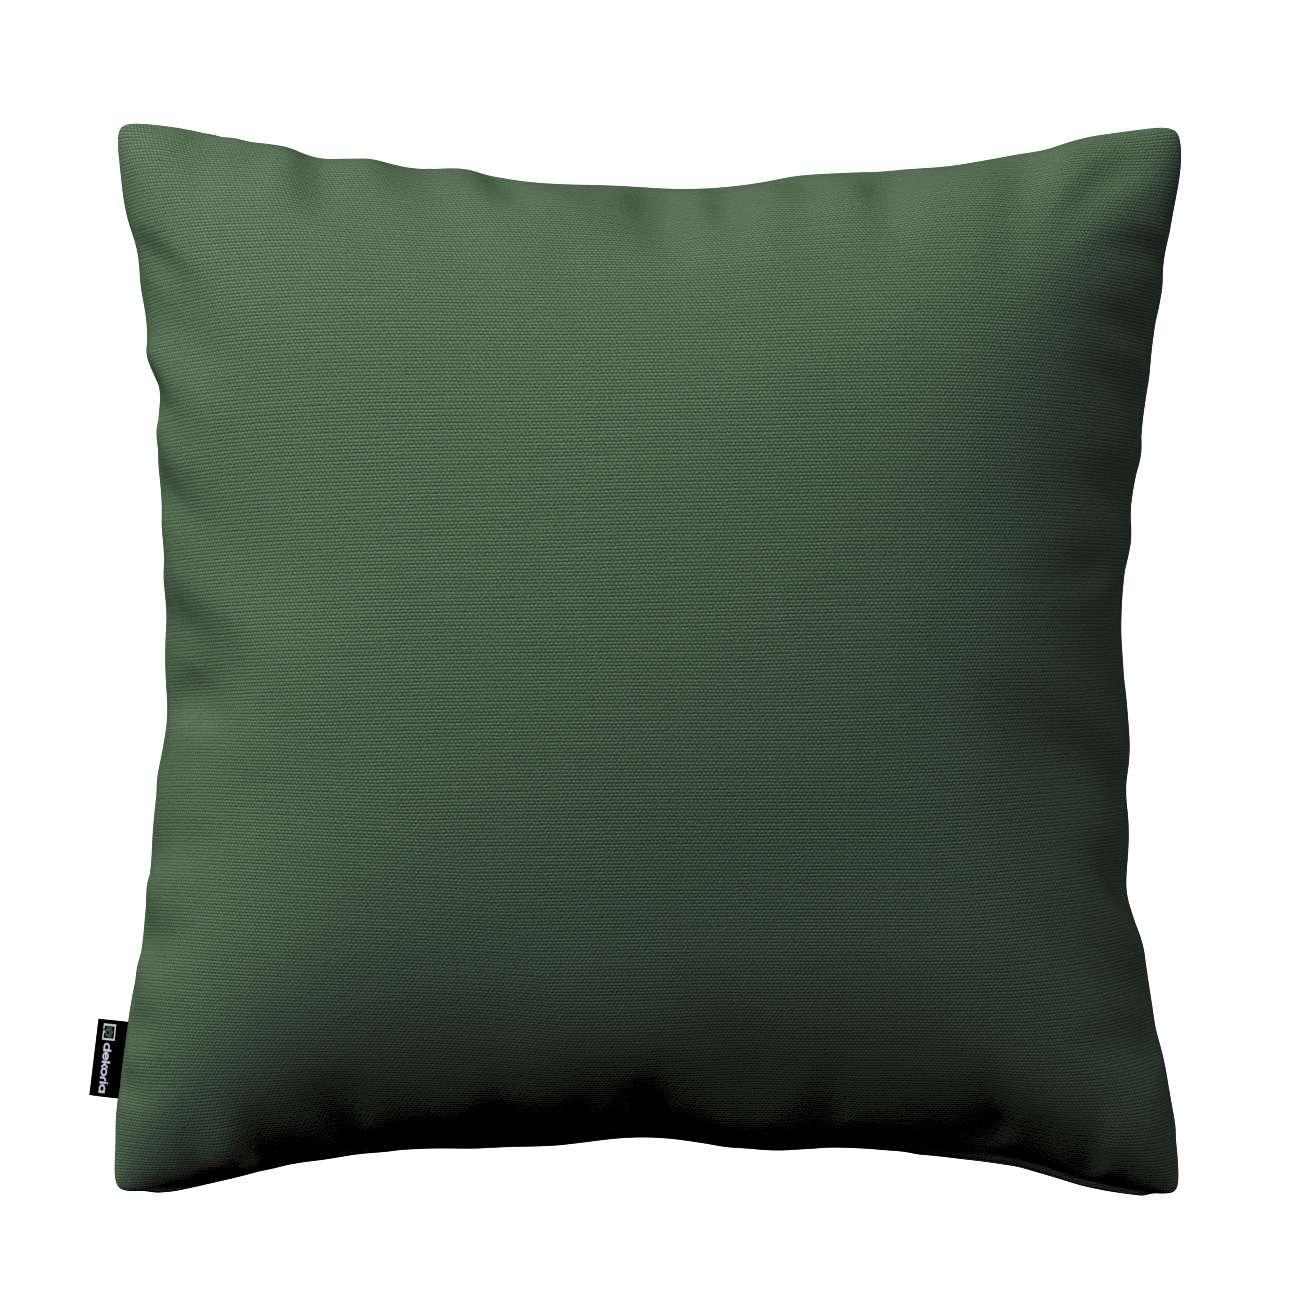 Kinga cushion cover 43 x 43 cm (17 x 17 inch) in collection Panama Cotton, fabric: 702-06